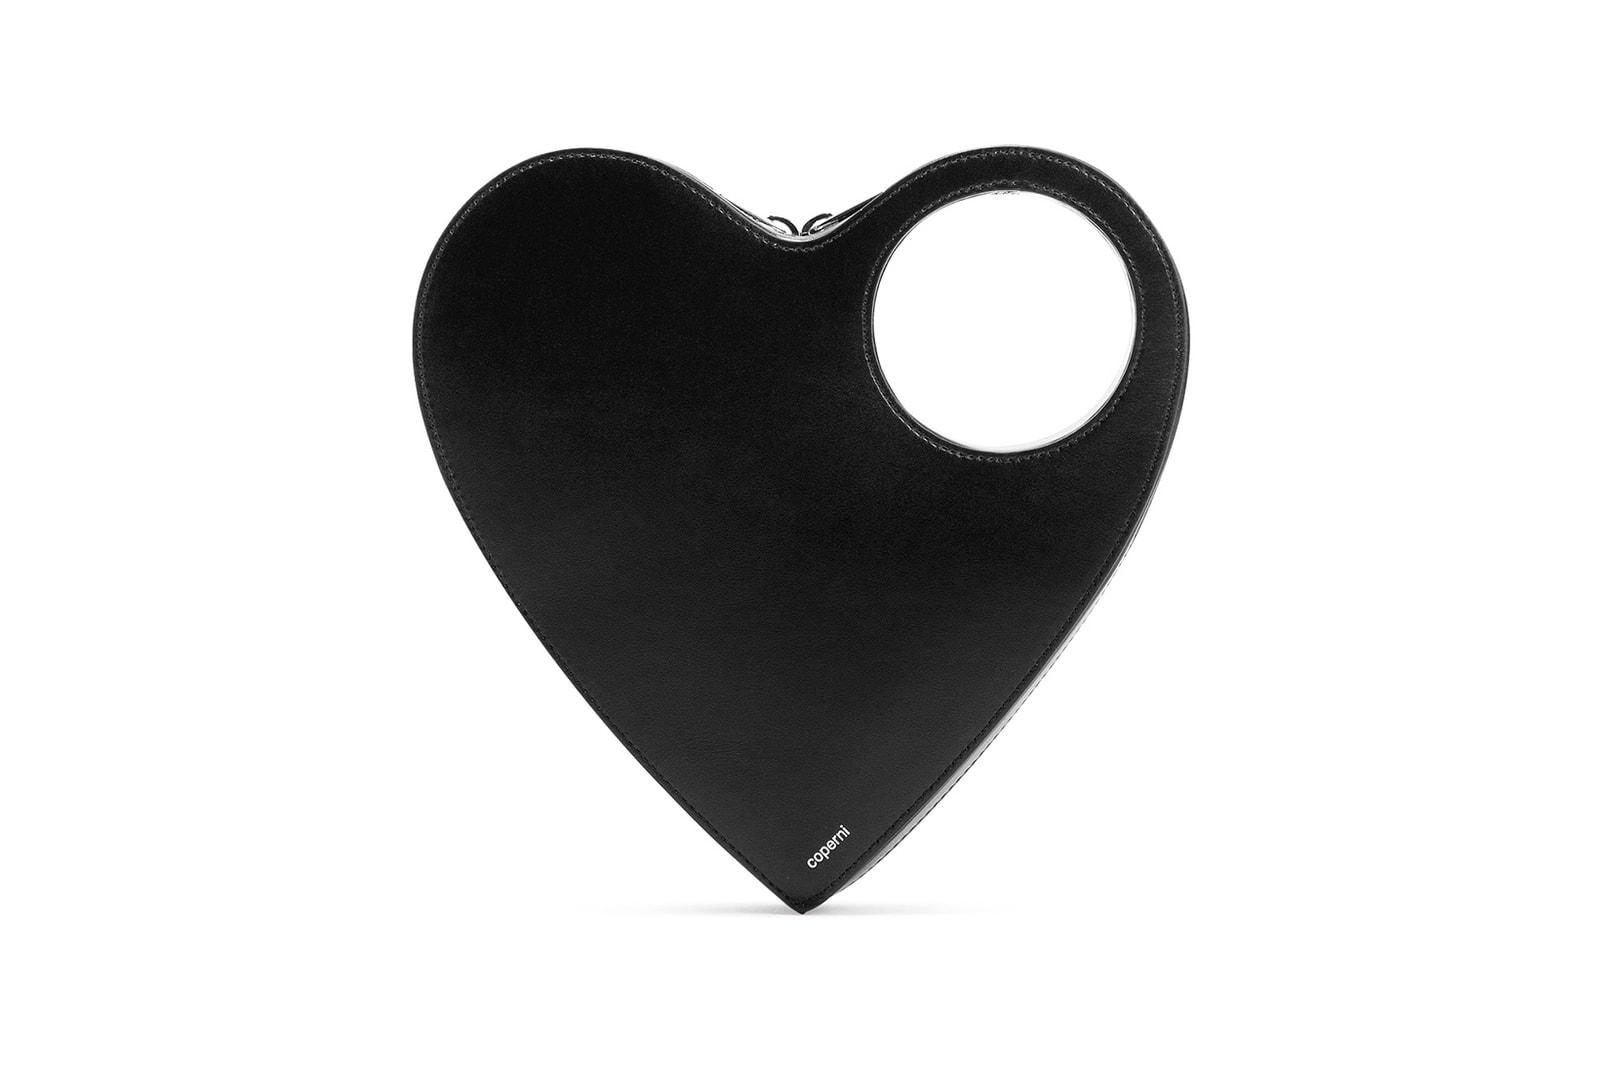 gucci valentine's day chain card case wallet glossier the perfect couple eau de parfum lipstick